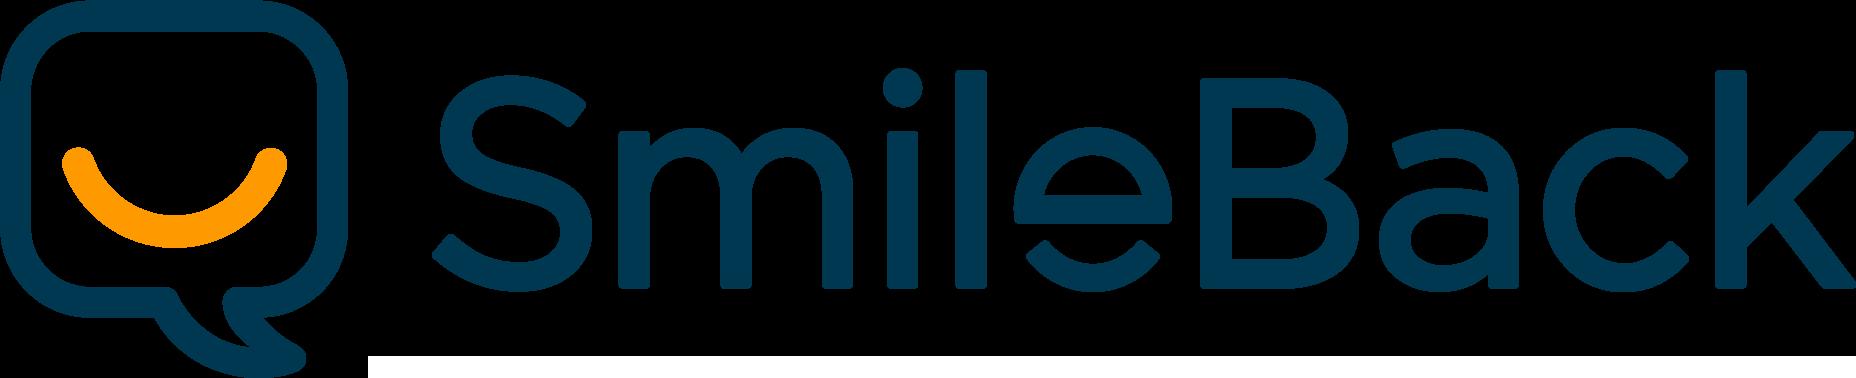 smileback-logo-2019-horizontal